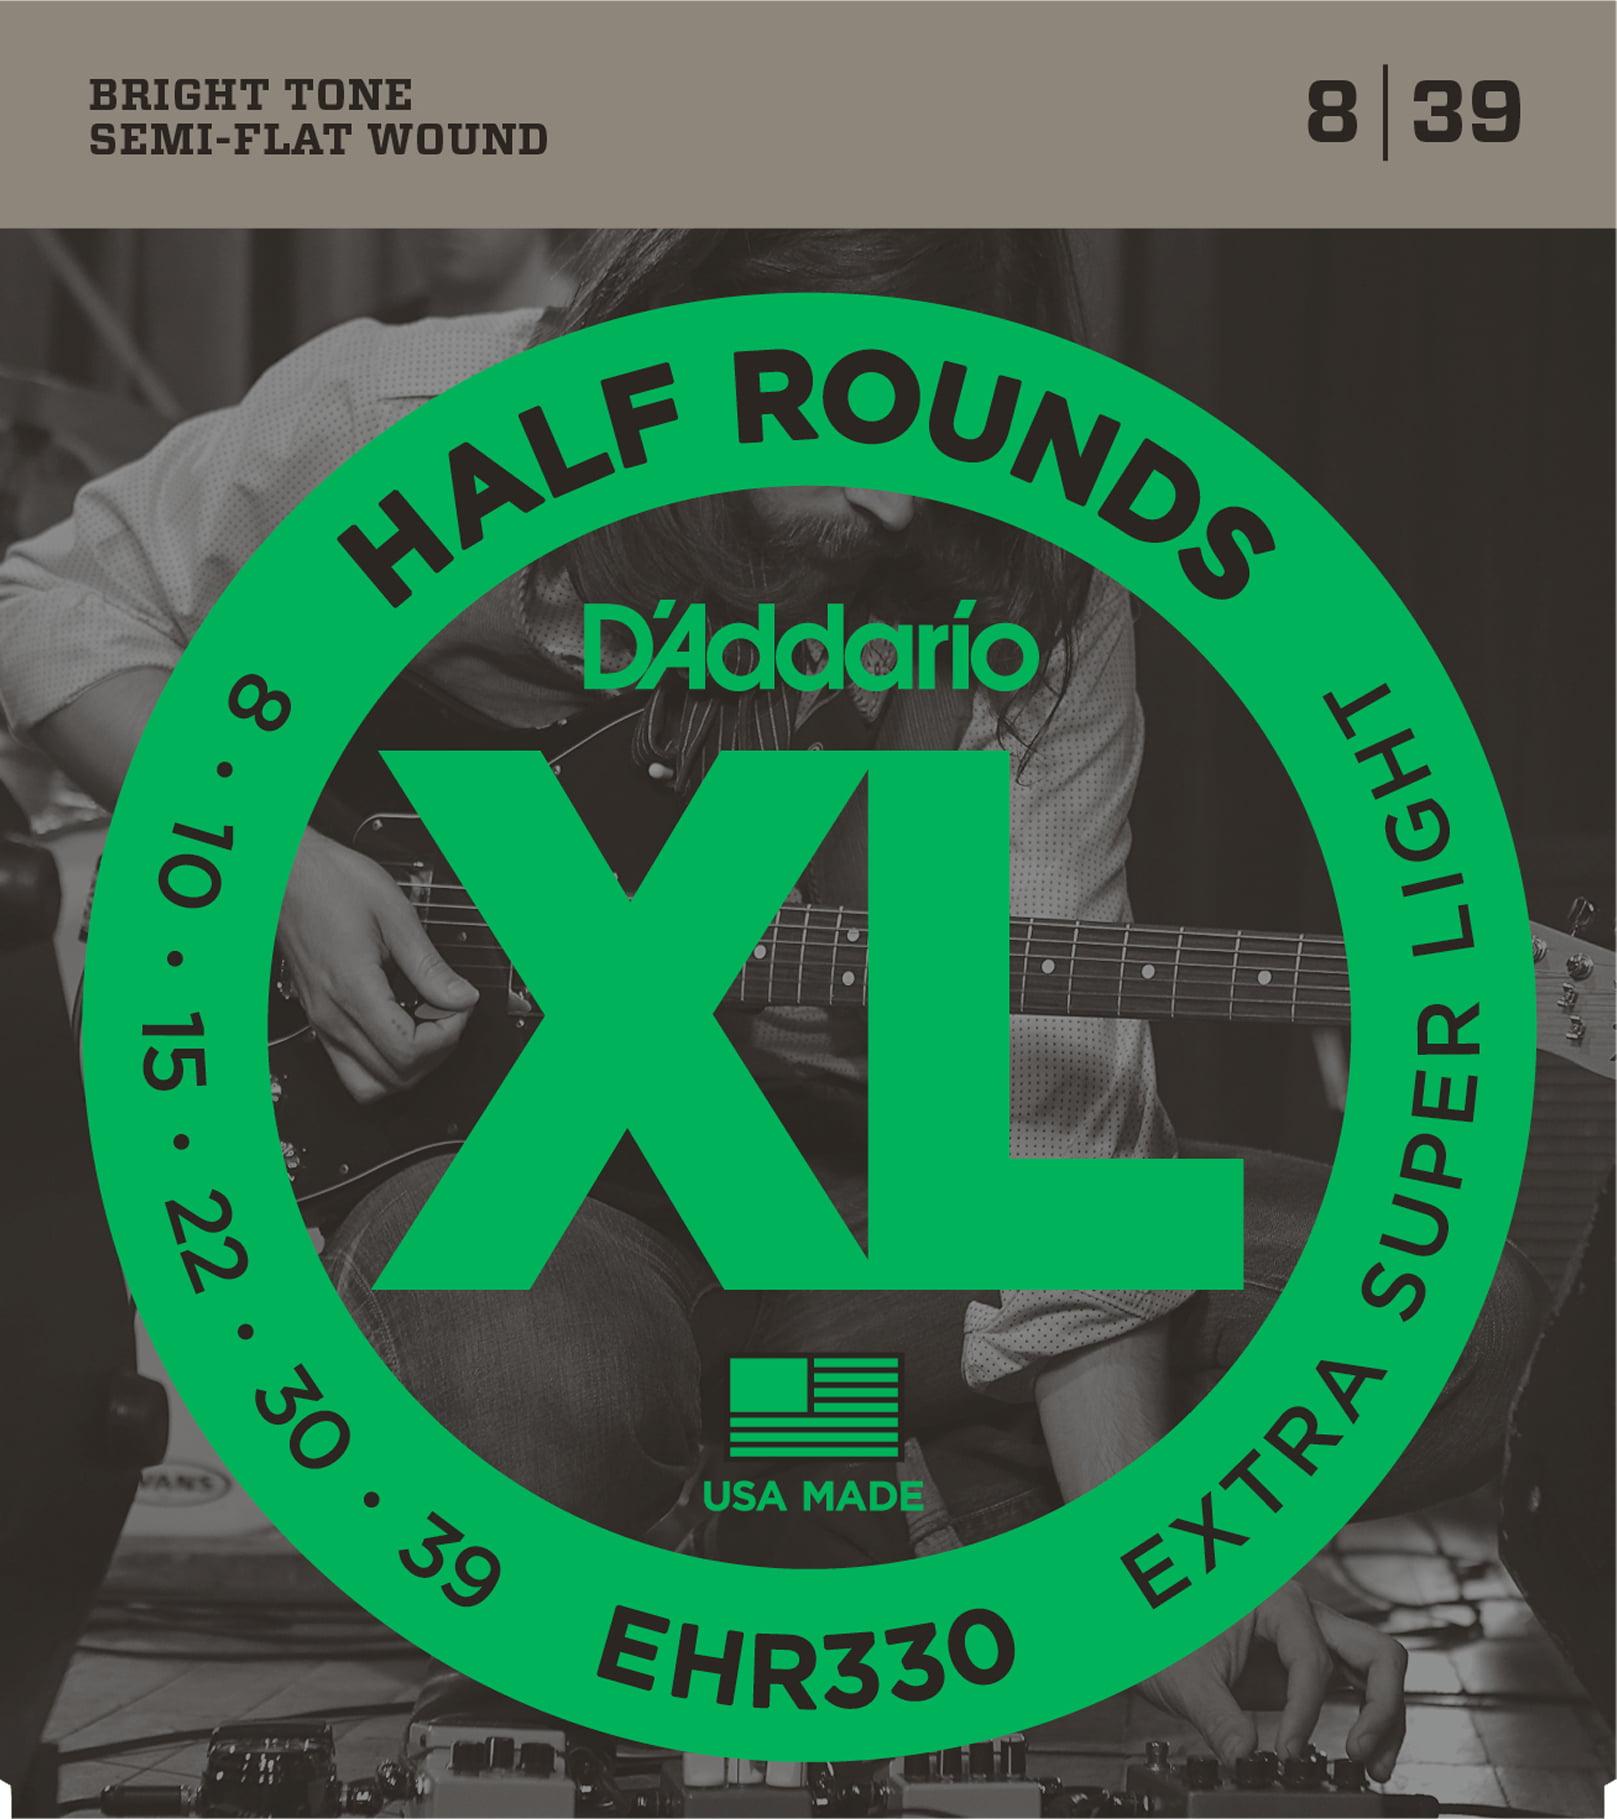 D'Addario EHR330 Half Round Electric Guitar Strings, Extra-Super Light, 8-39 by D'Addario